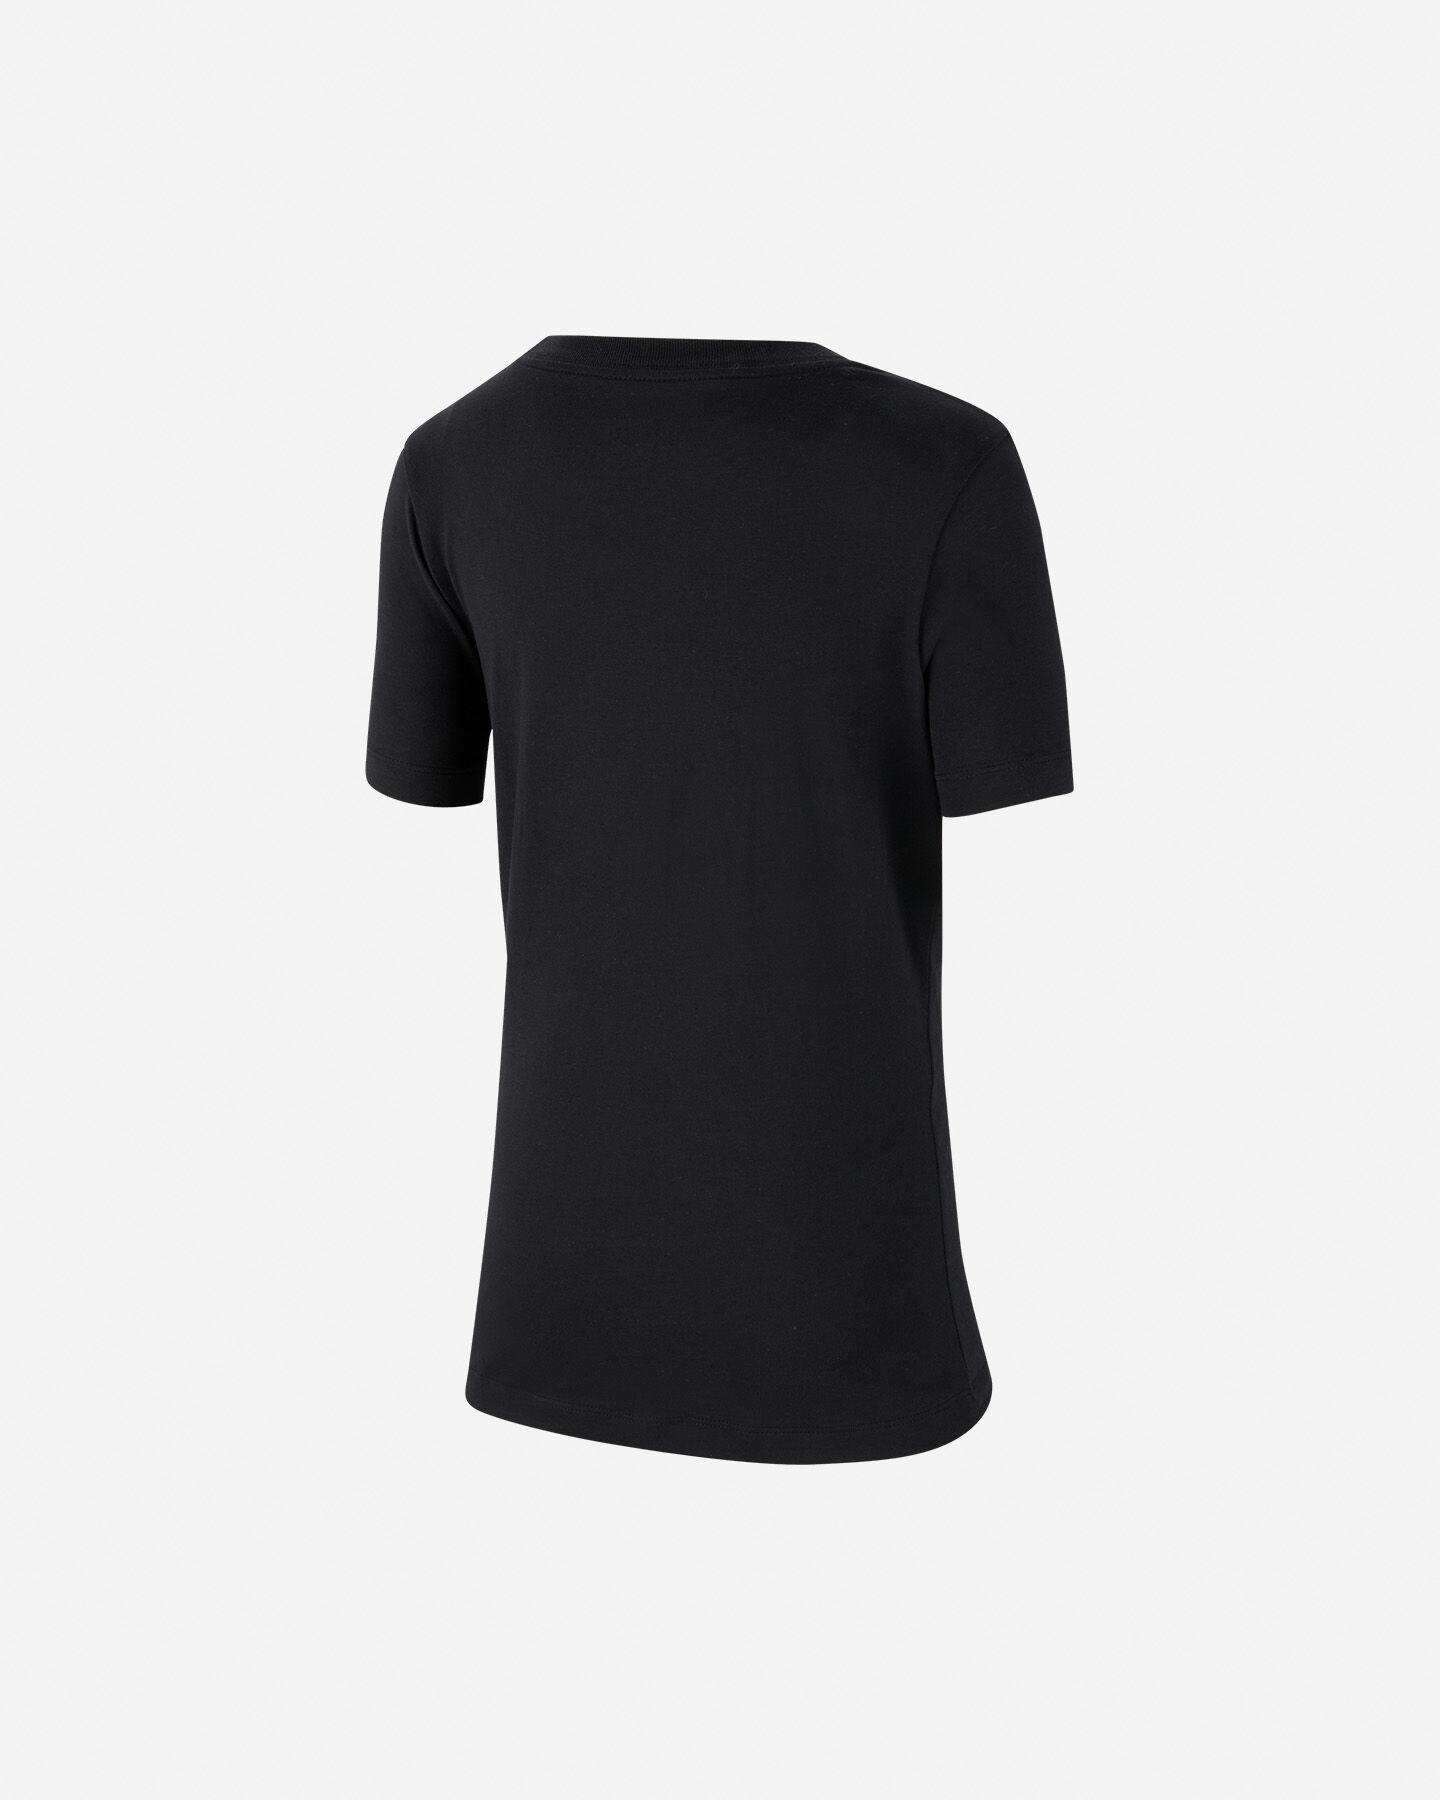 T-Shirt NIKE DRI-FIT GIANNIS FREAK JR S5225963 scatto 1